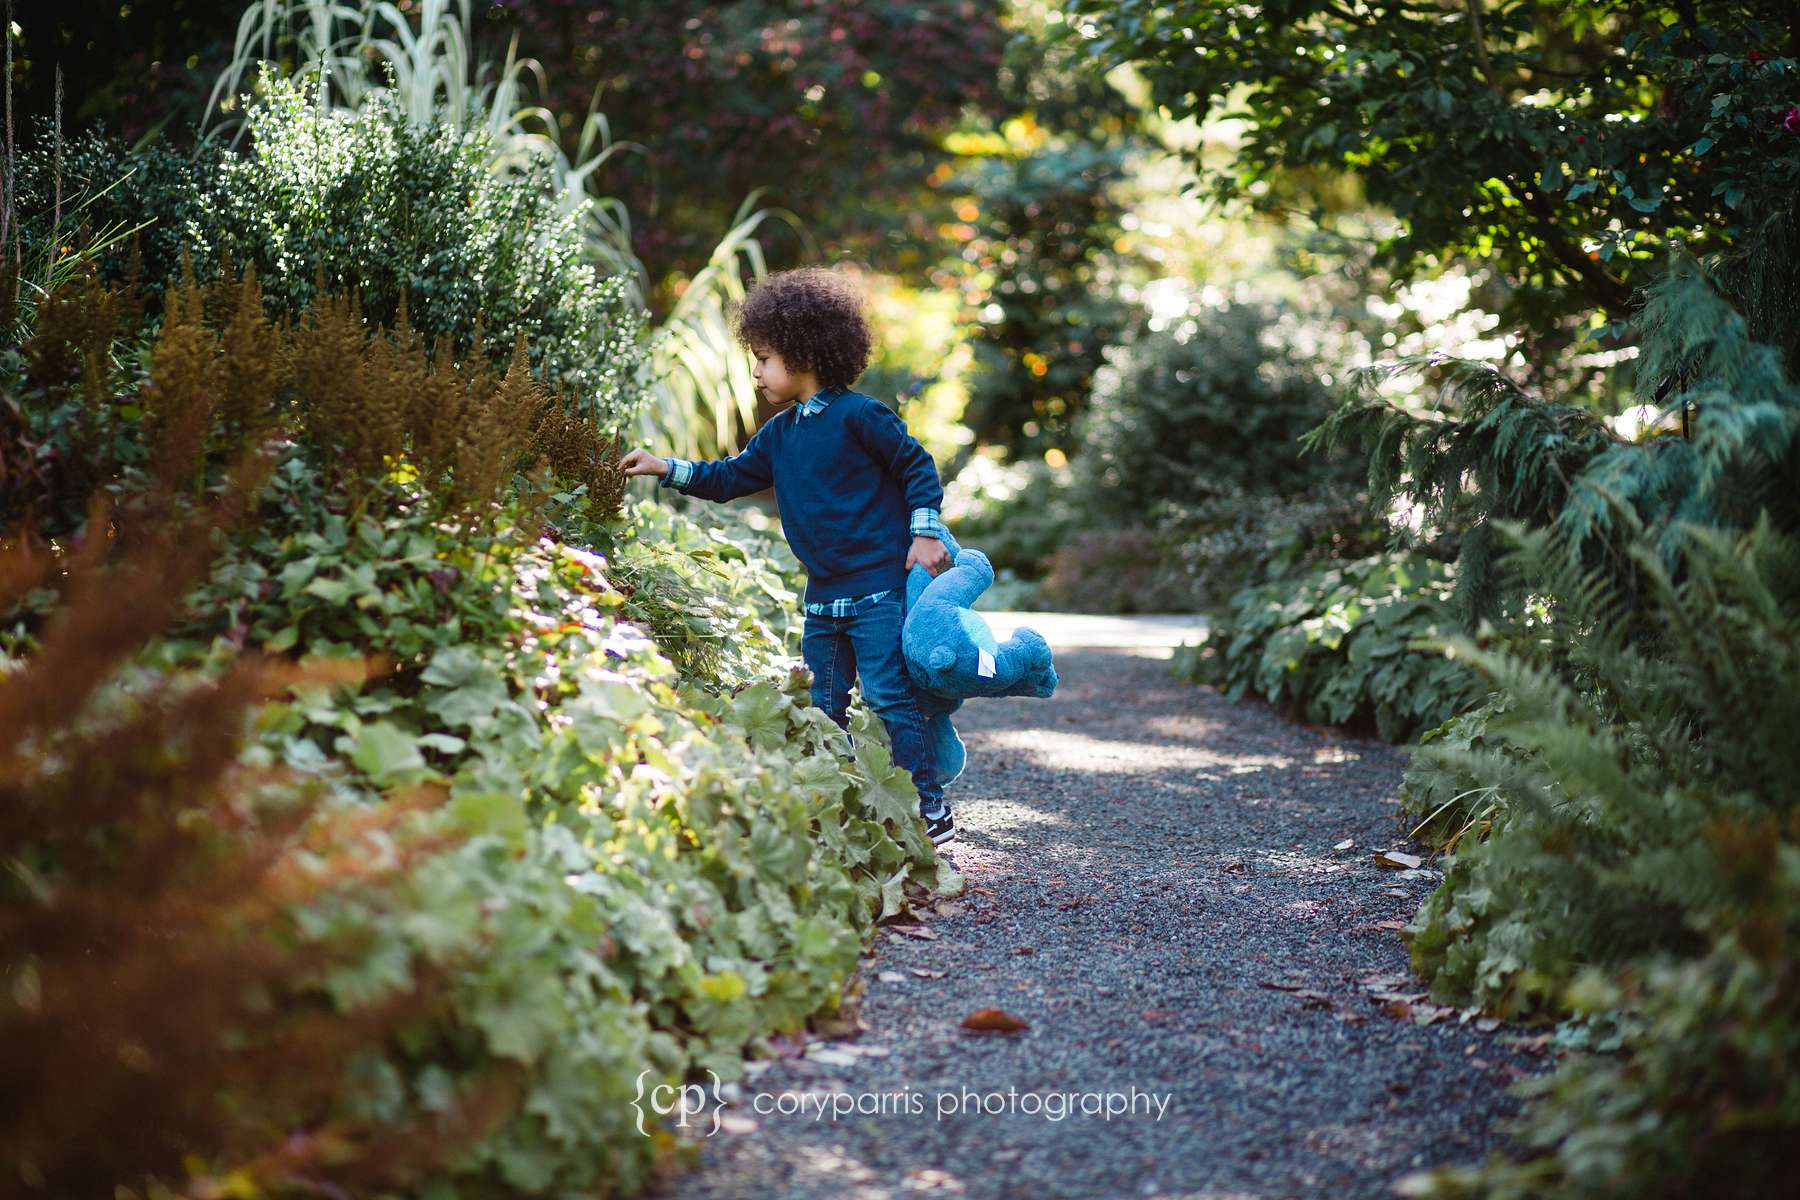 Kids portrait photography in Bellevue